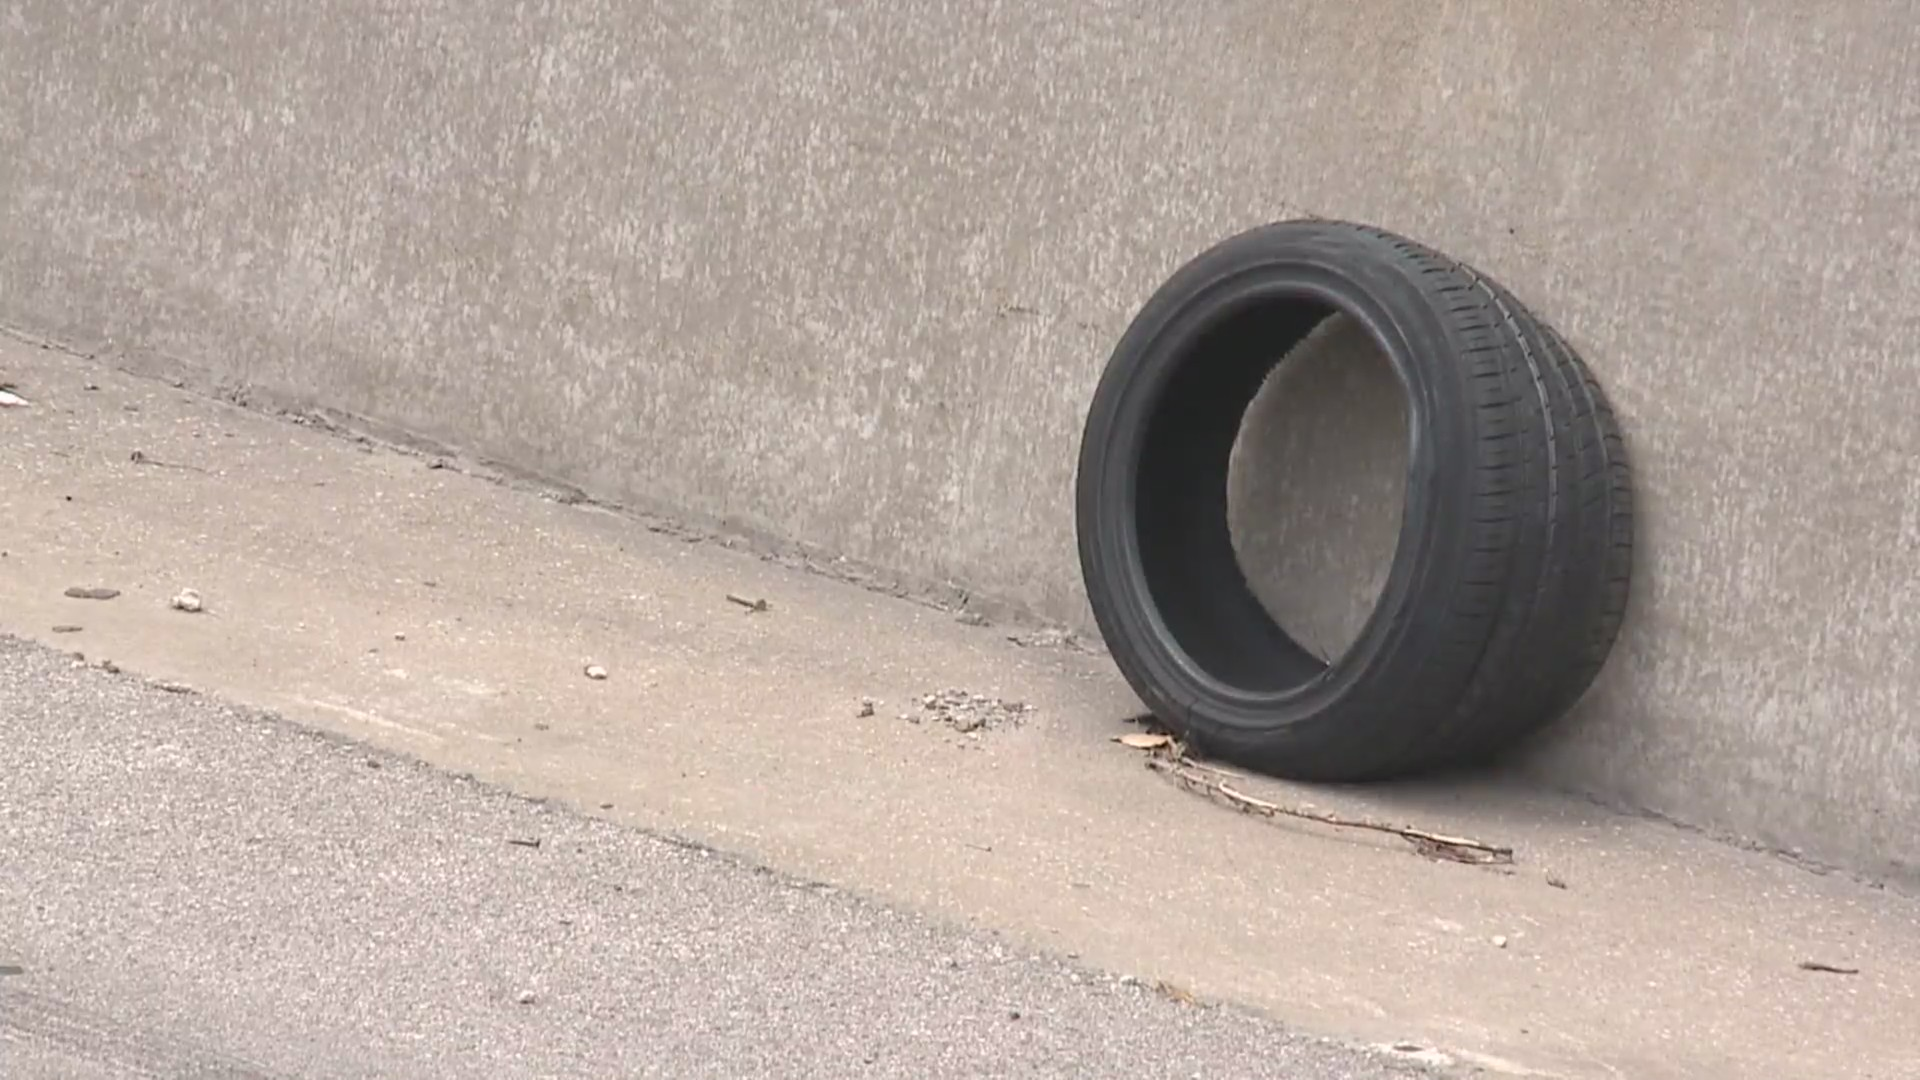 roadway debris tire